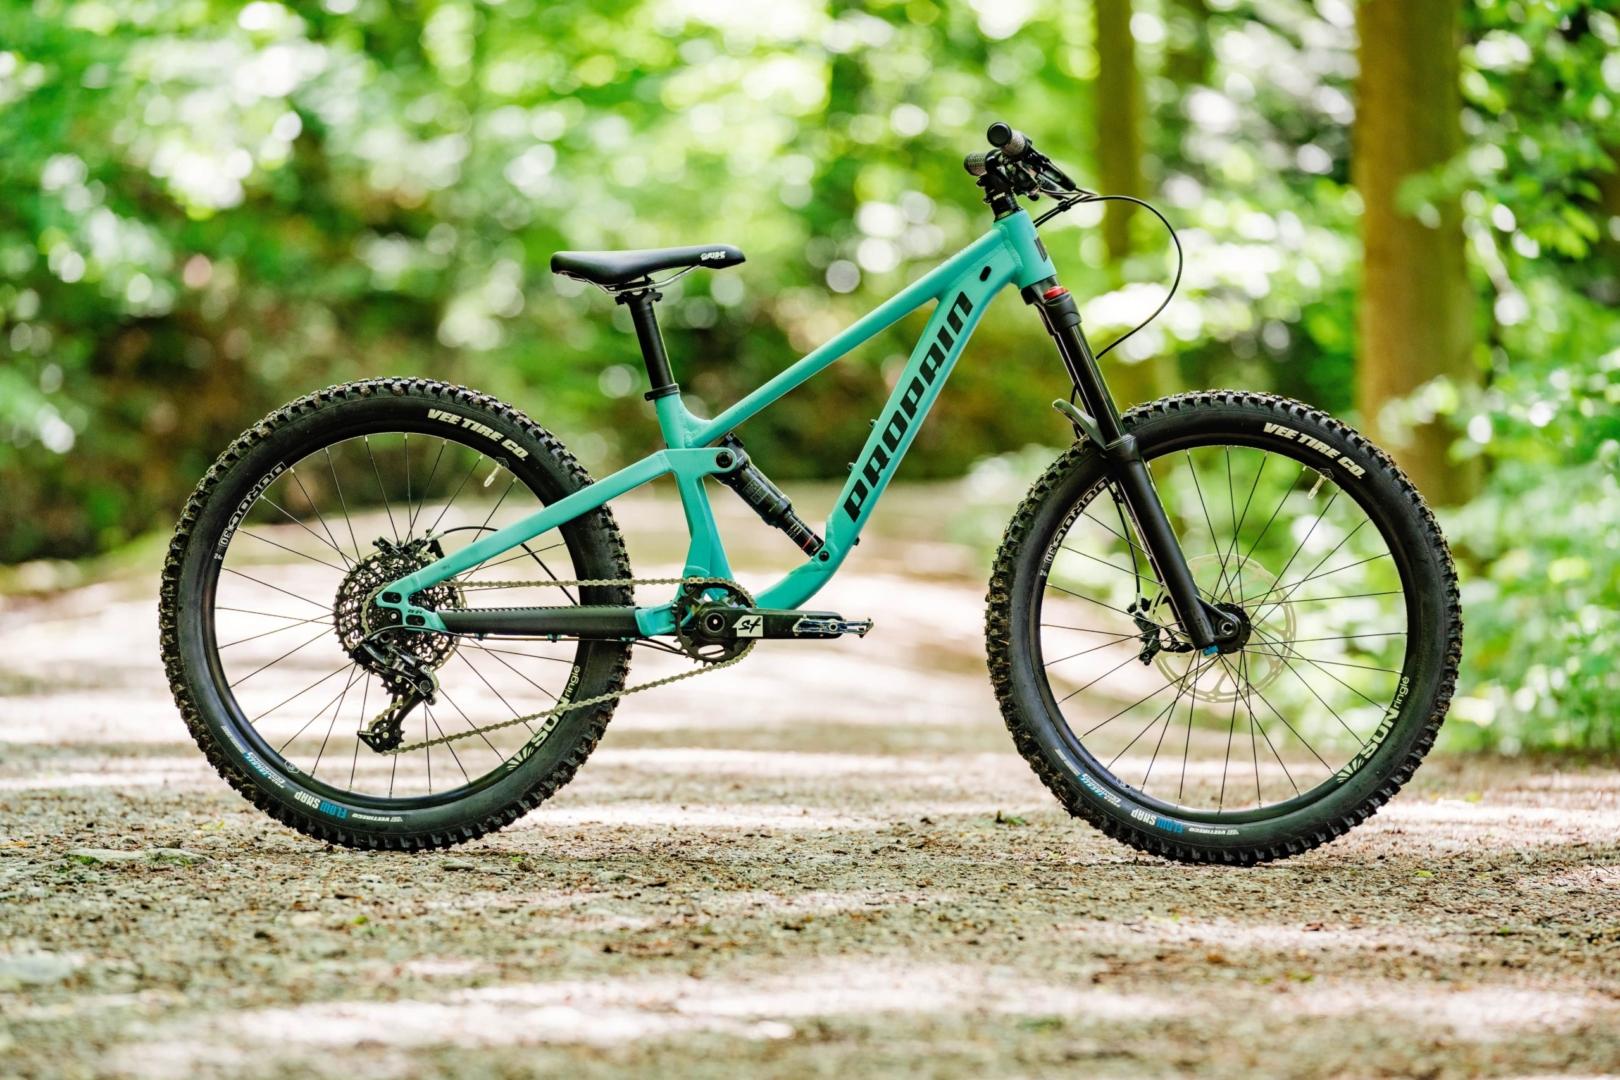 PROPAIN-Yuma-MY21-Weingarten_Bike-Still-Forest-scaled.jpg